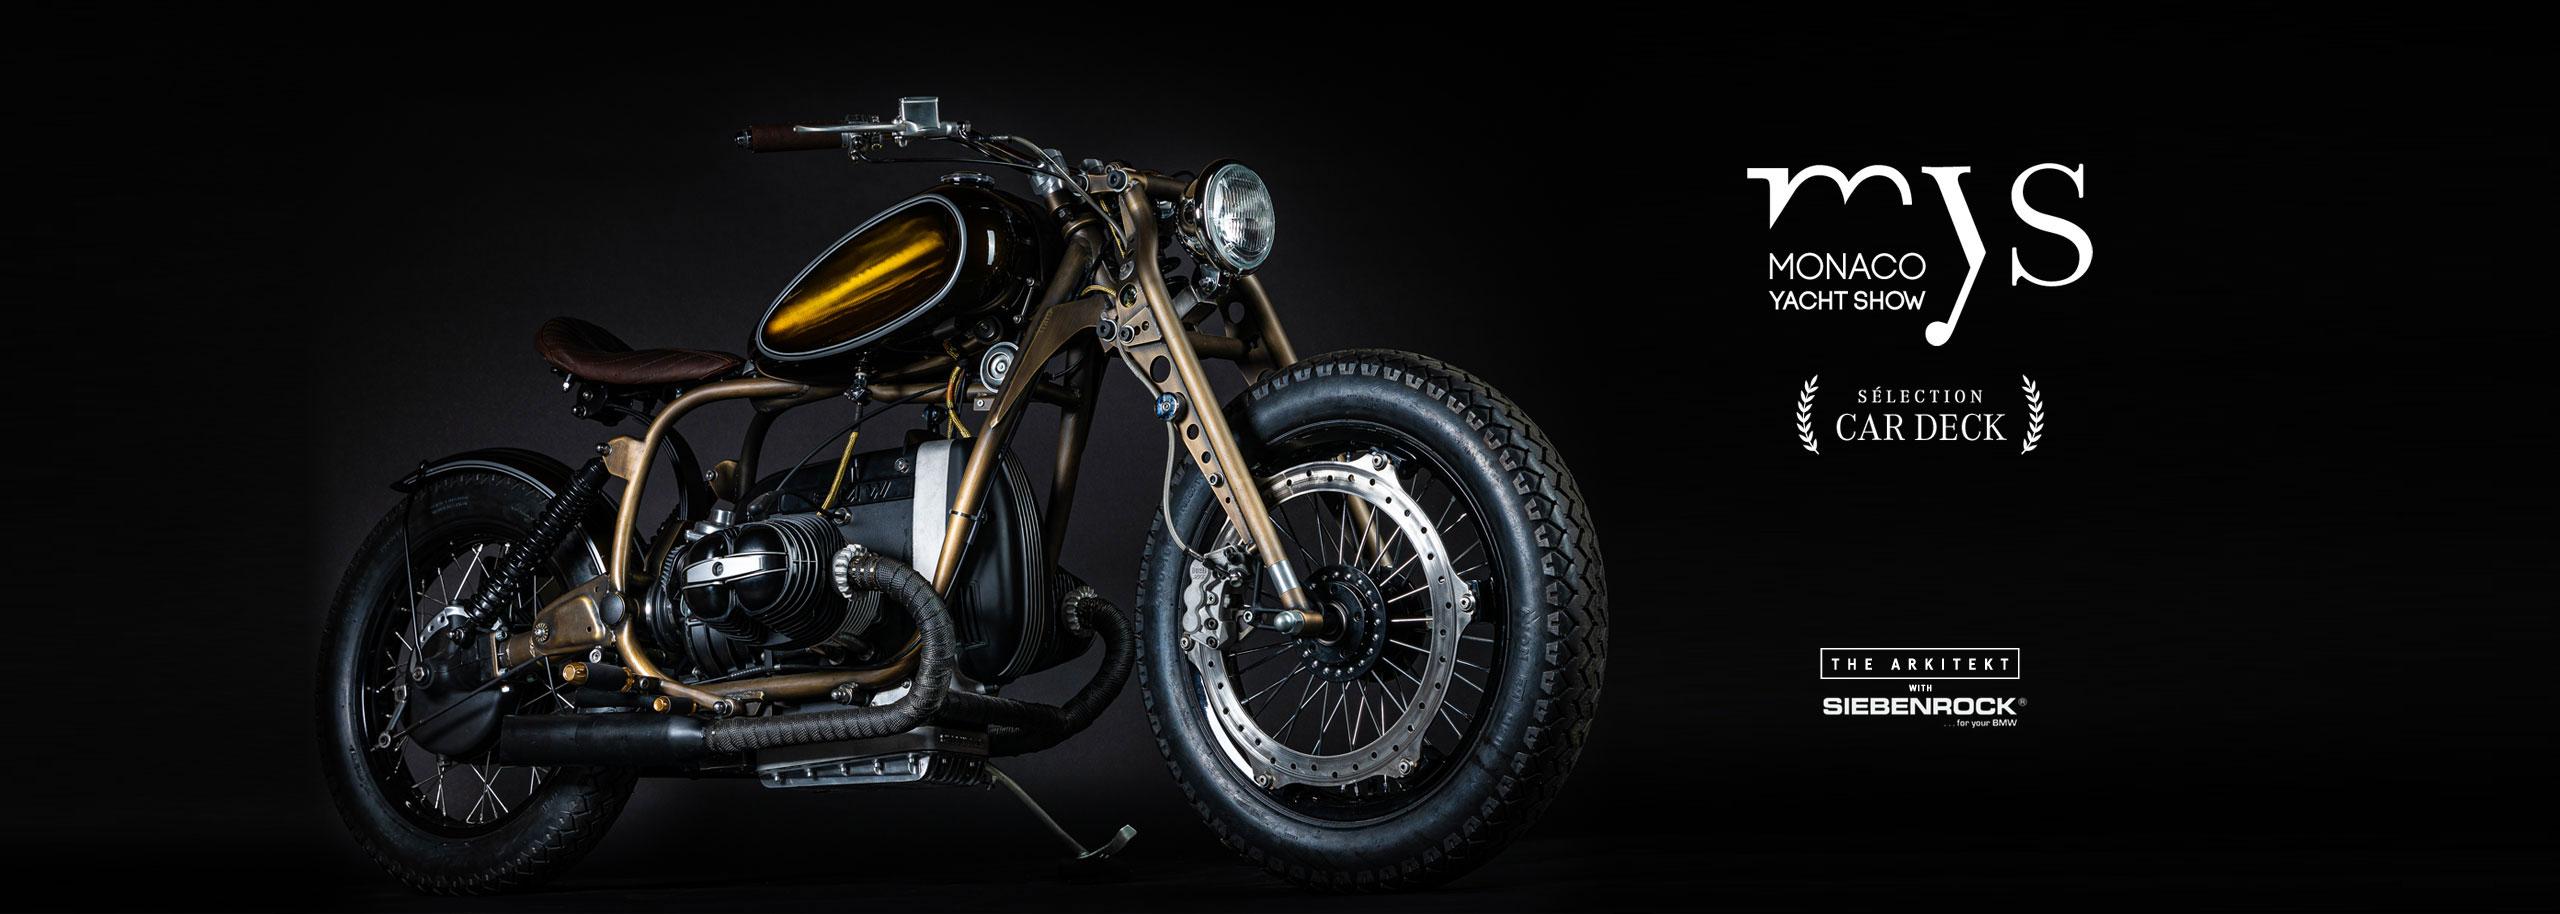 Custom-Bike-Austria-Graz-Cafe-Racer-BMW-Concept-The-Arkitekt-Motorrad-Umbau-typisiert-Monaco-Yacht-Show